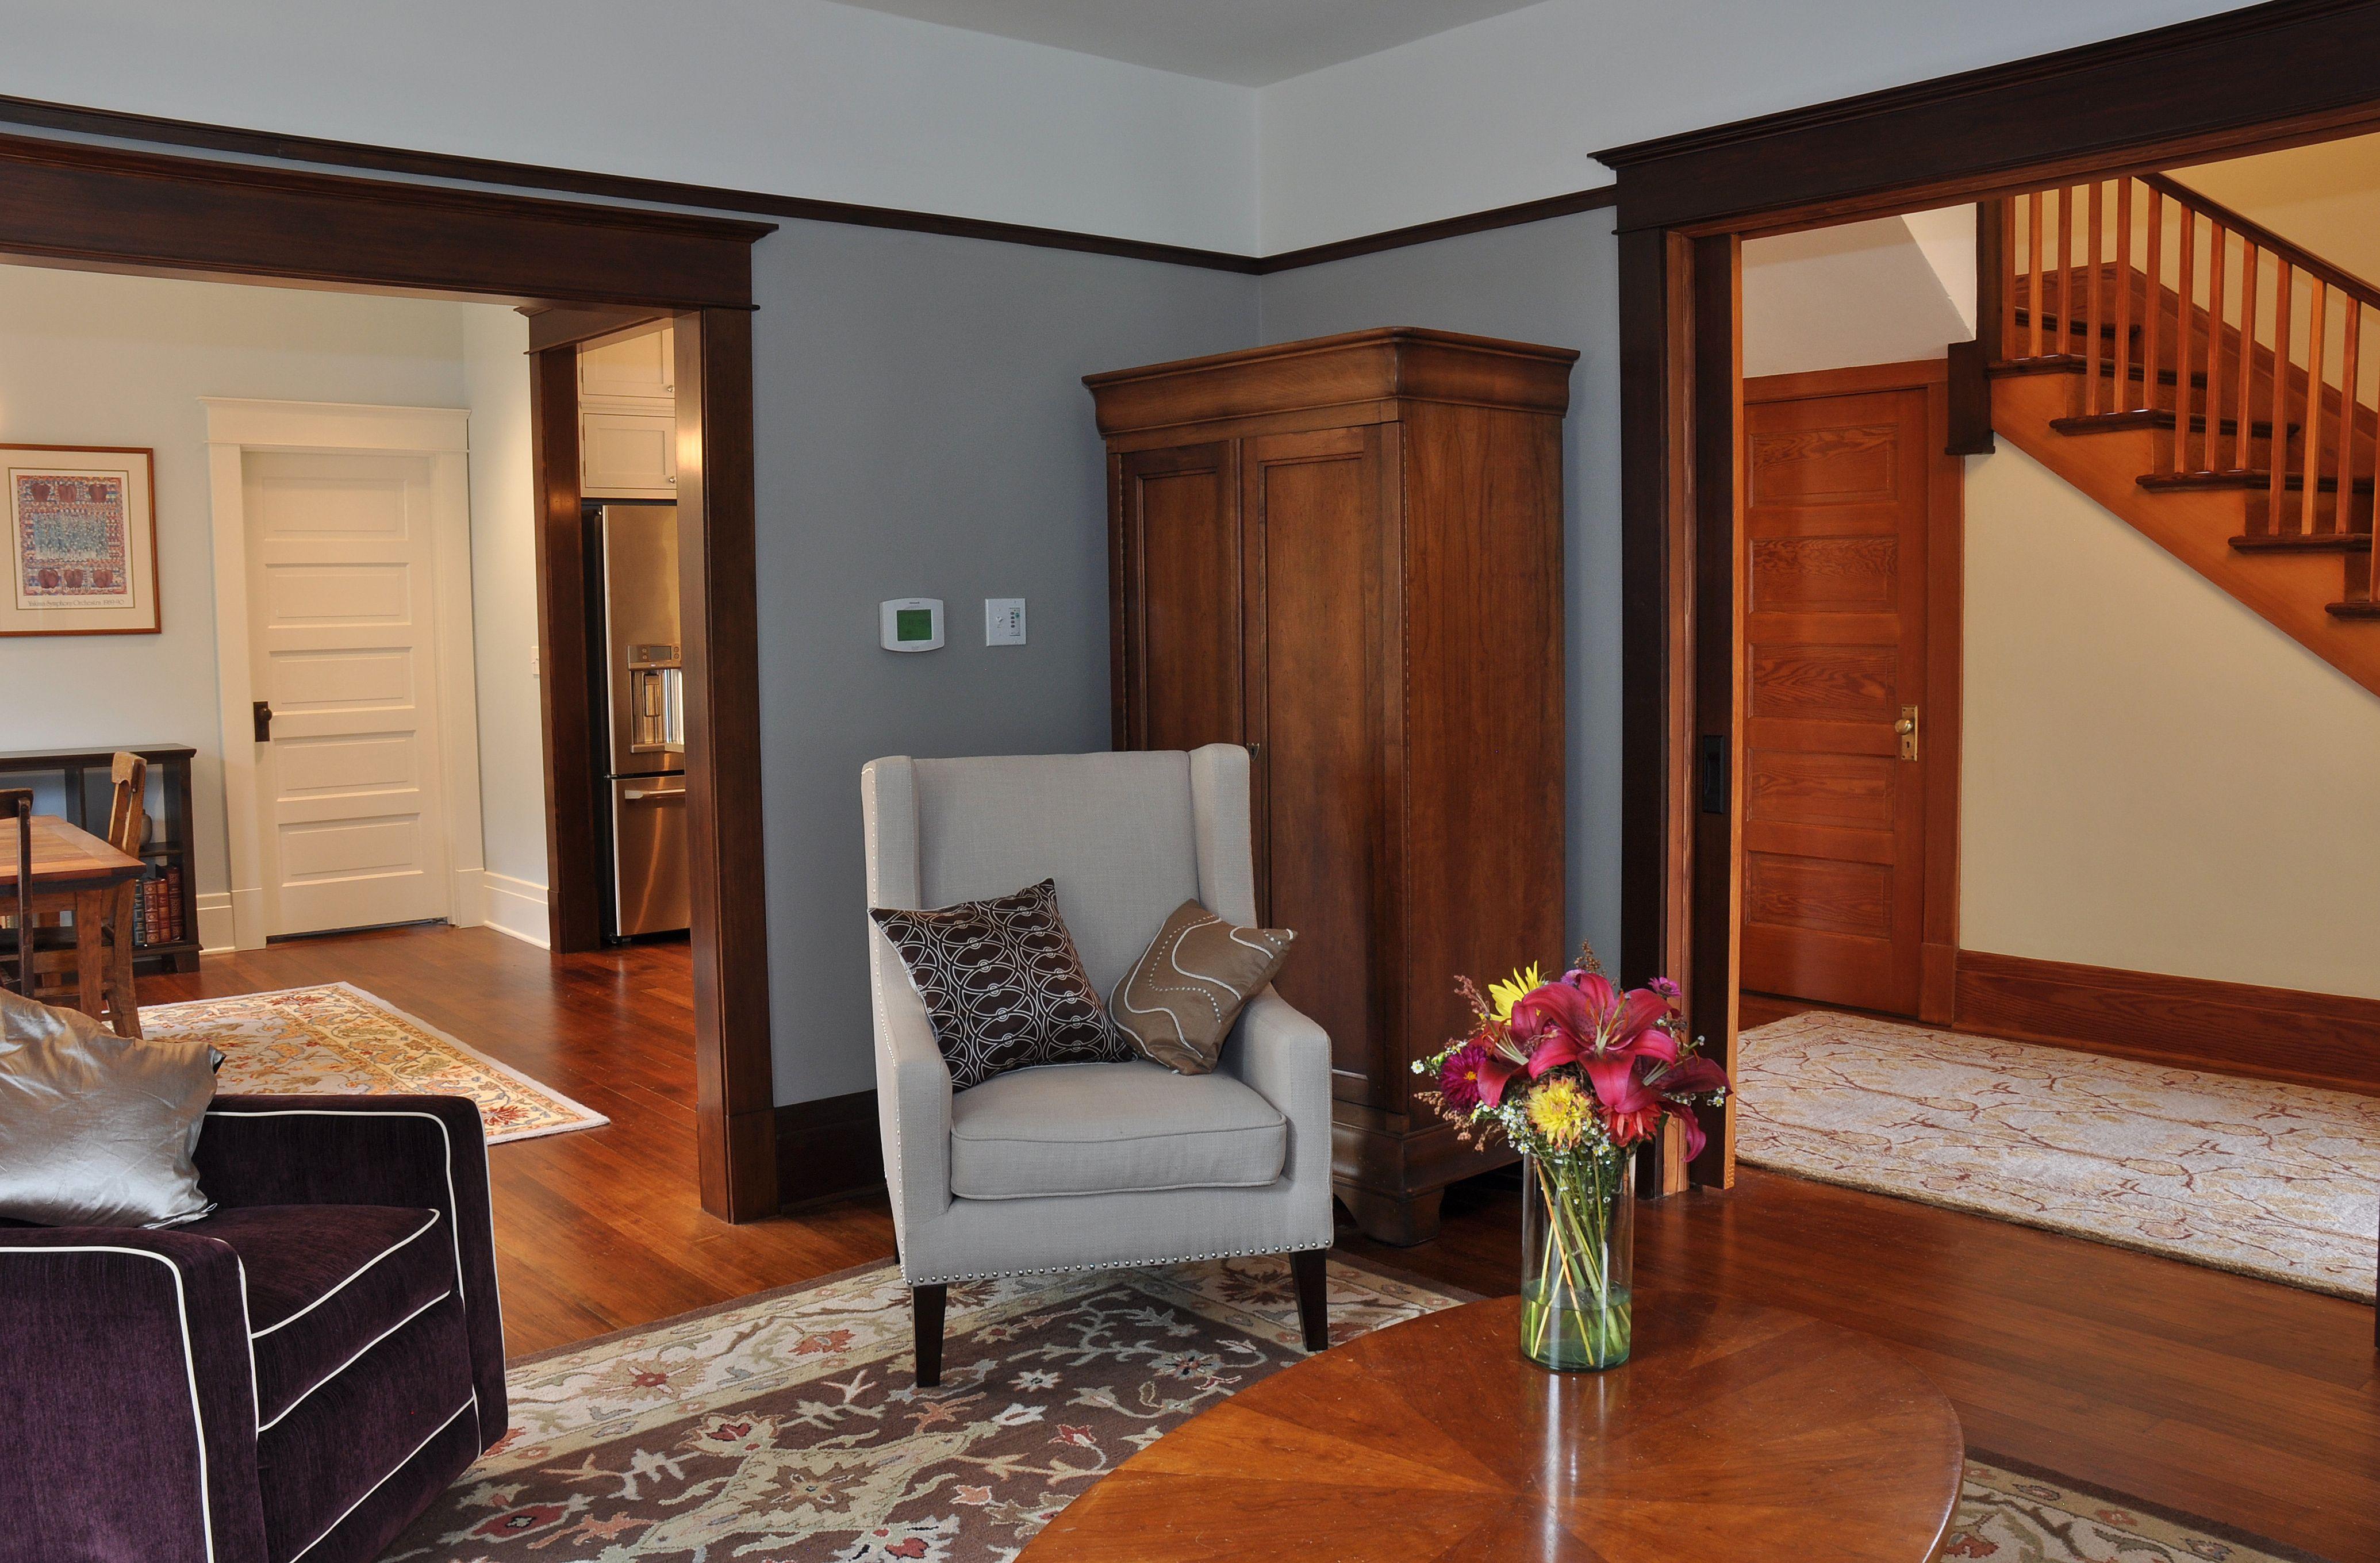 Craftsman style living room with original hardwood floors